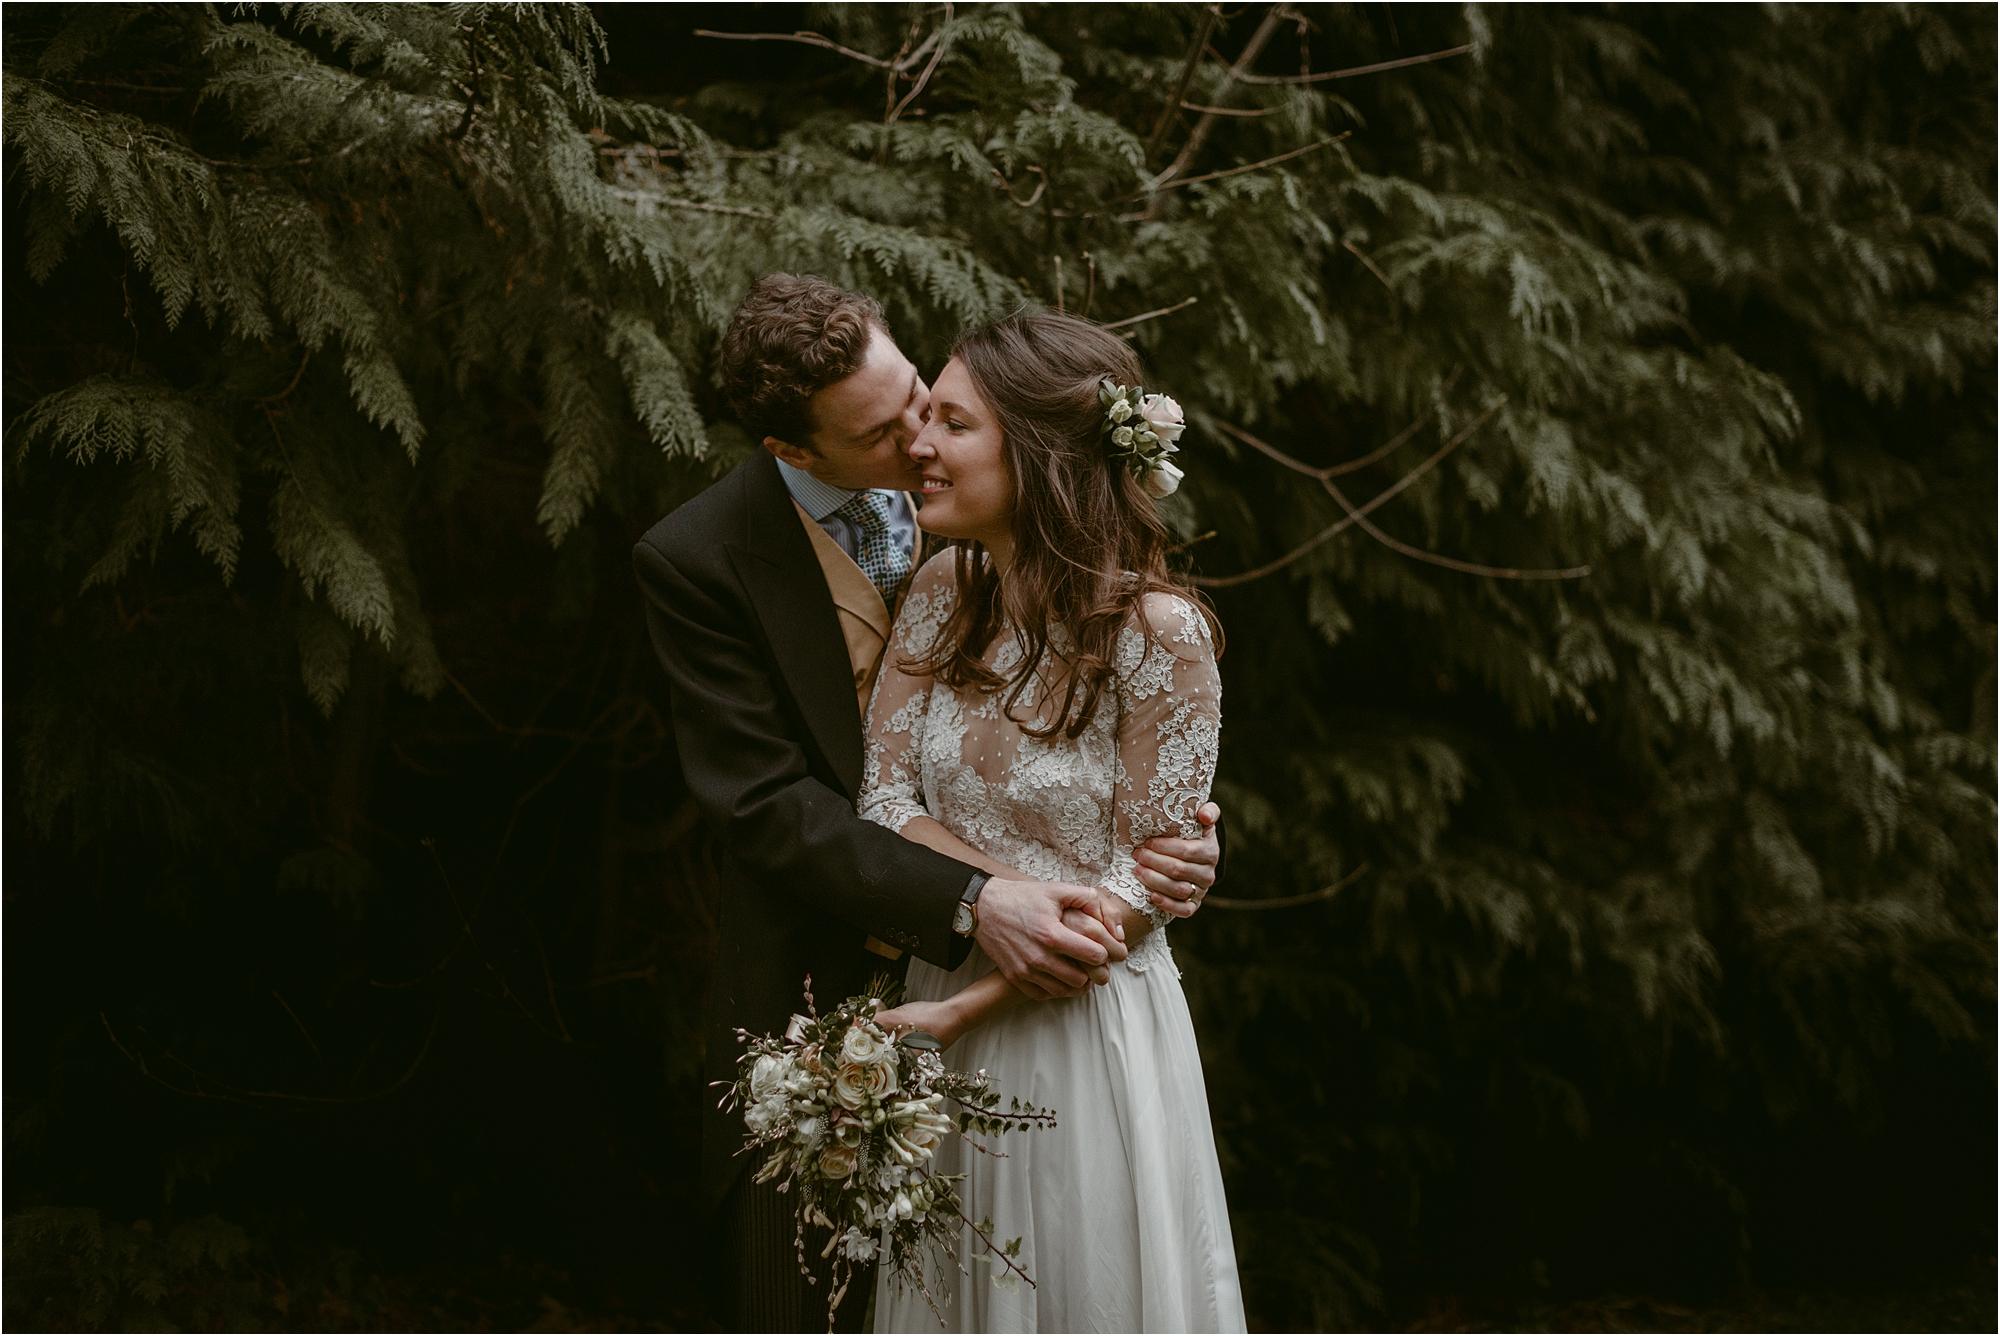 Rose+Harry-outdoor-english-wedding-photography__0149.jpg